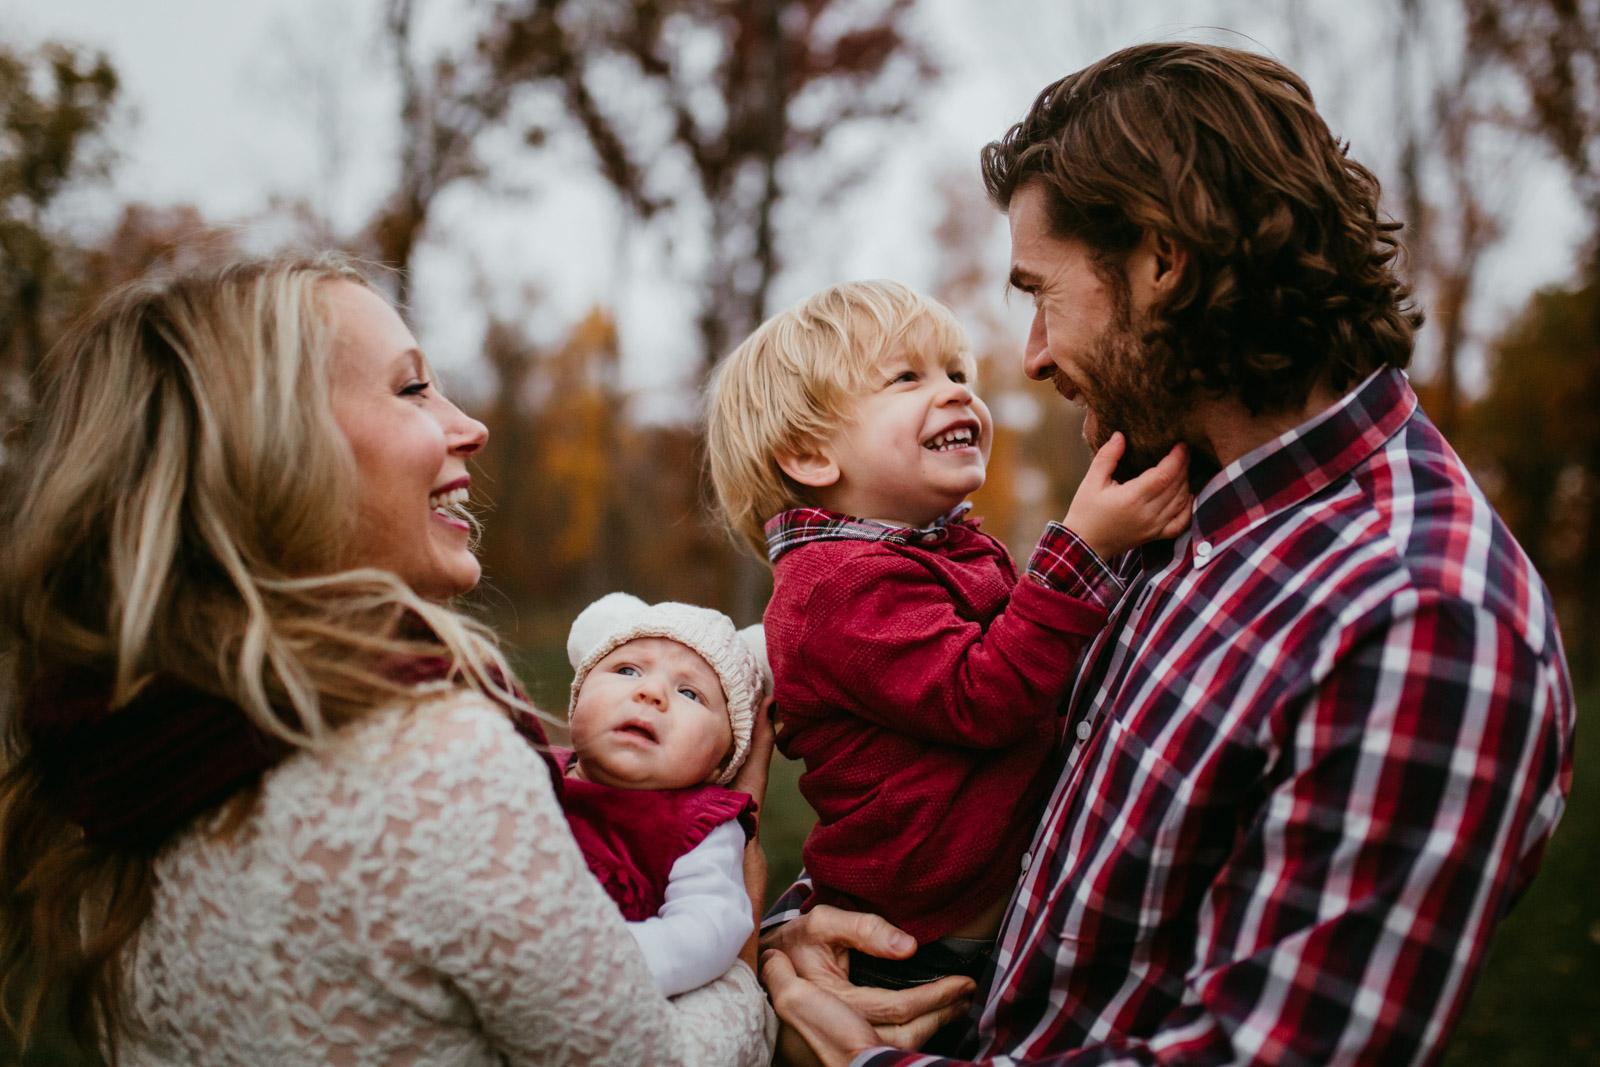 Family of four at The Barn at One Loudoun, Ashburn, Virginia